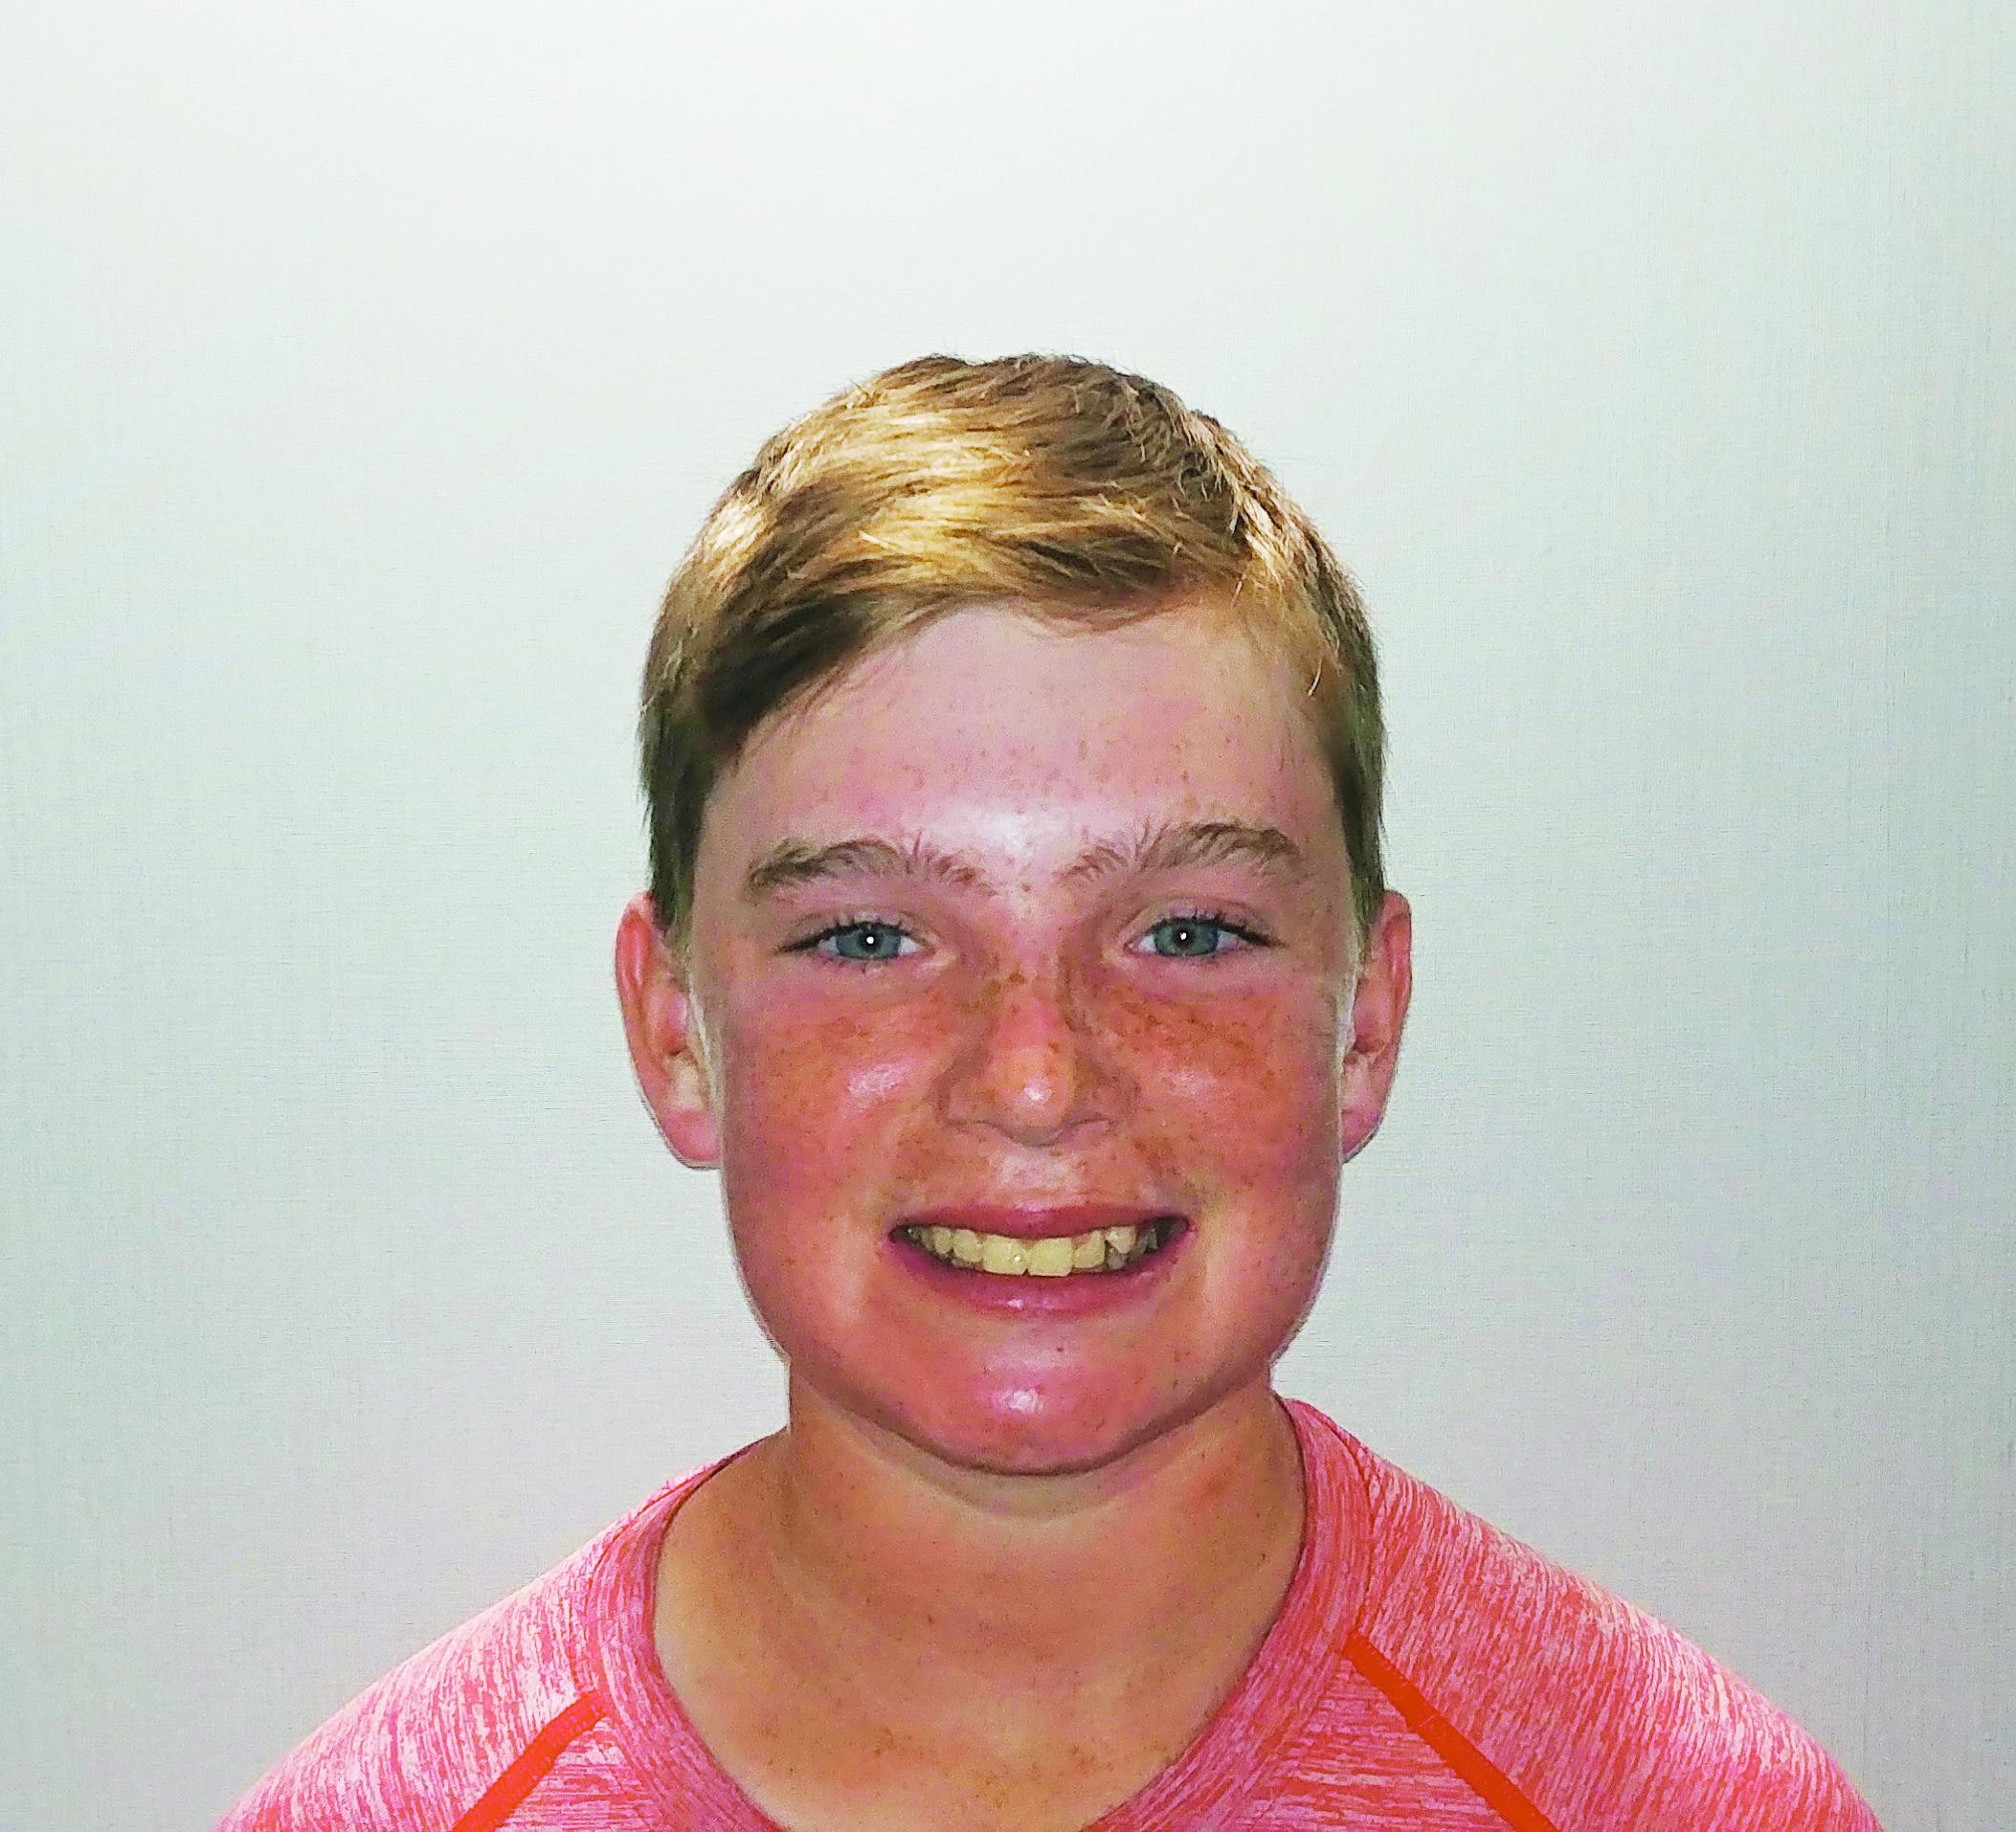 Snowboarding because it looks like a challenge.  Aidan  Age 13